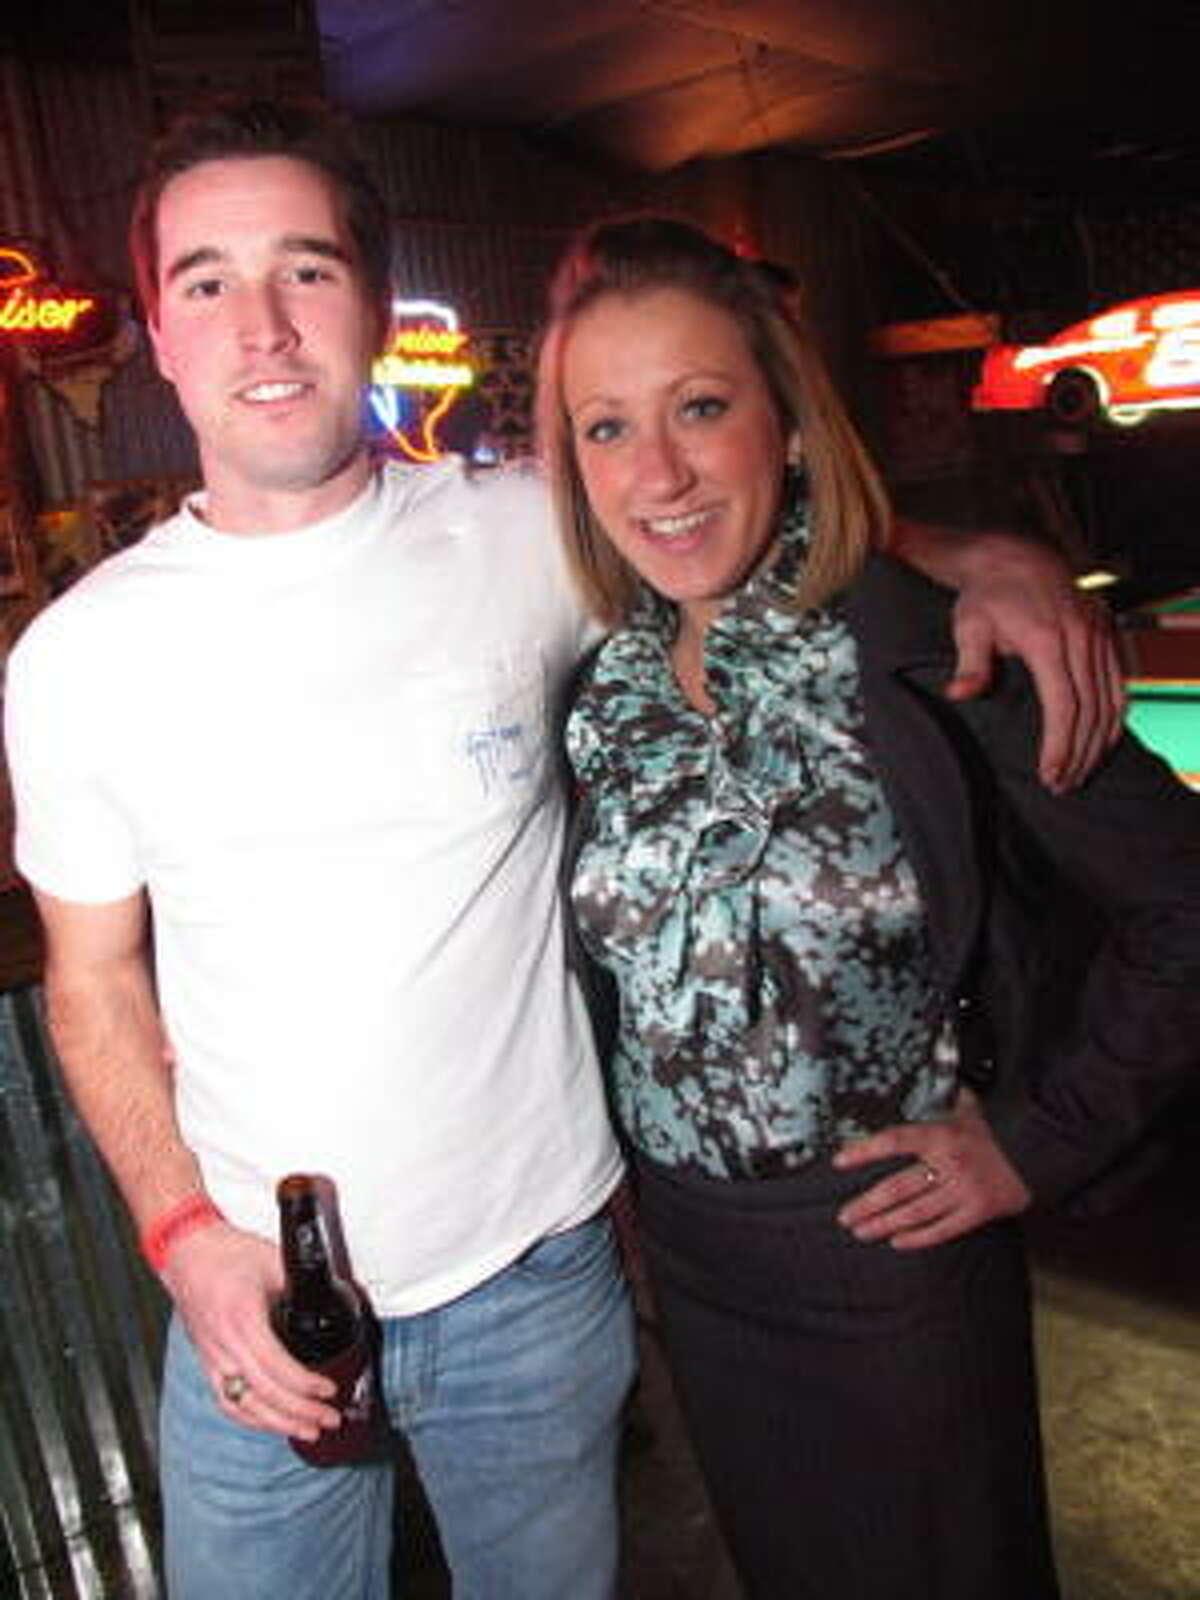 Bryan Brown, left, and Erin Kassab